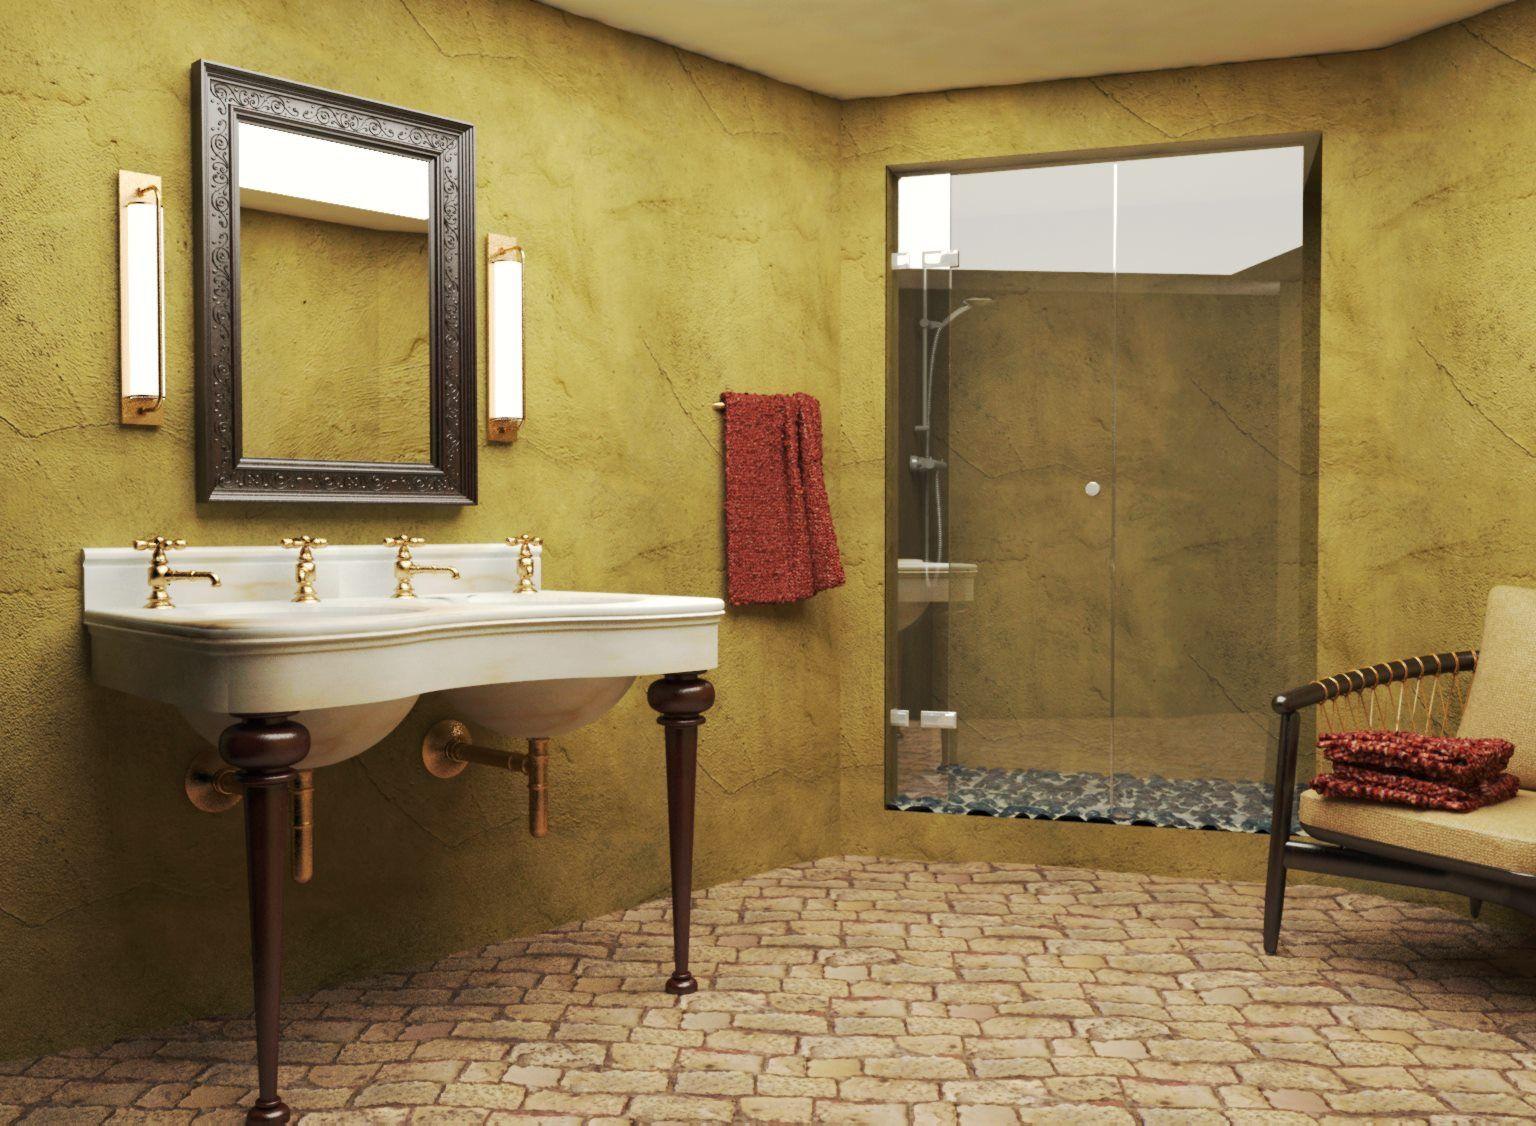 Pin de Jorge Batalla en CUARTOS DE BAÑO | Cuartos de baño ...